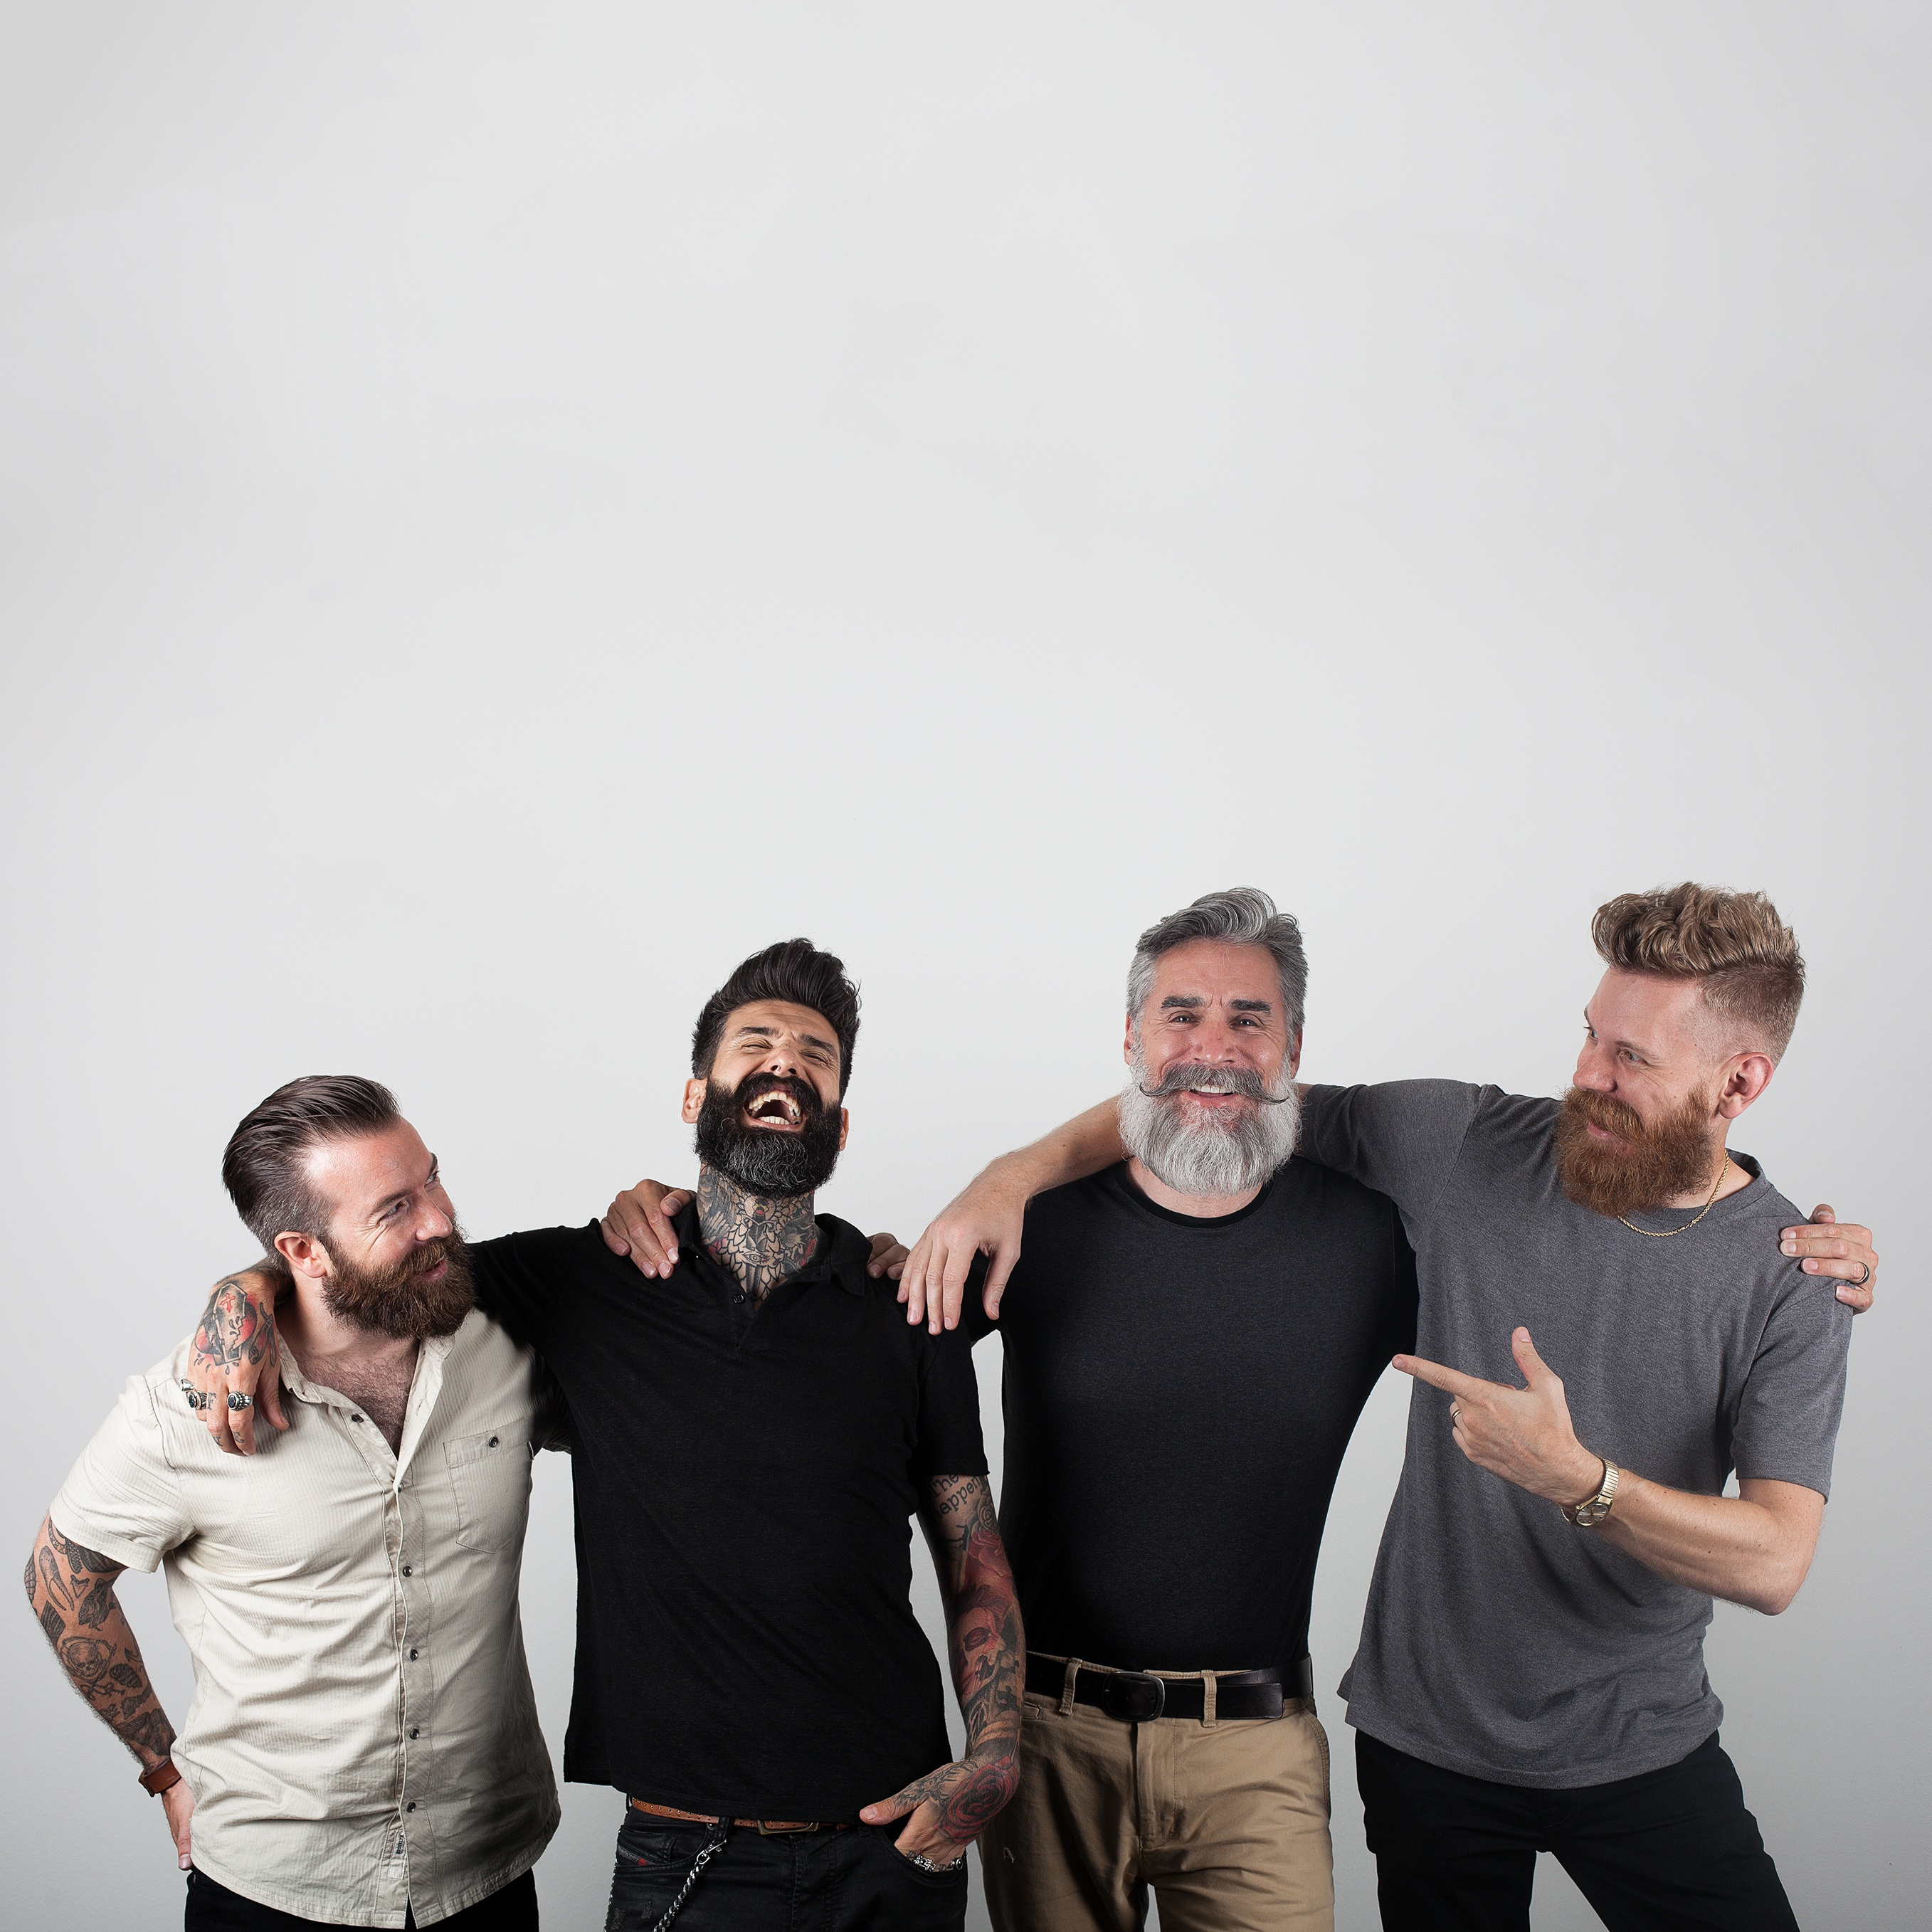 Four men with excellent beards enjoying camaraderie